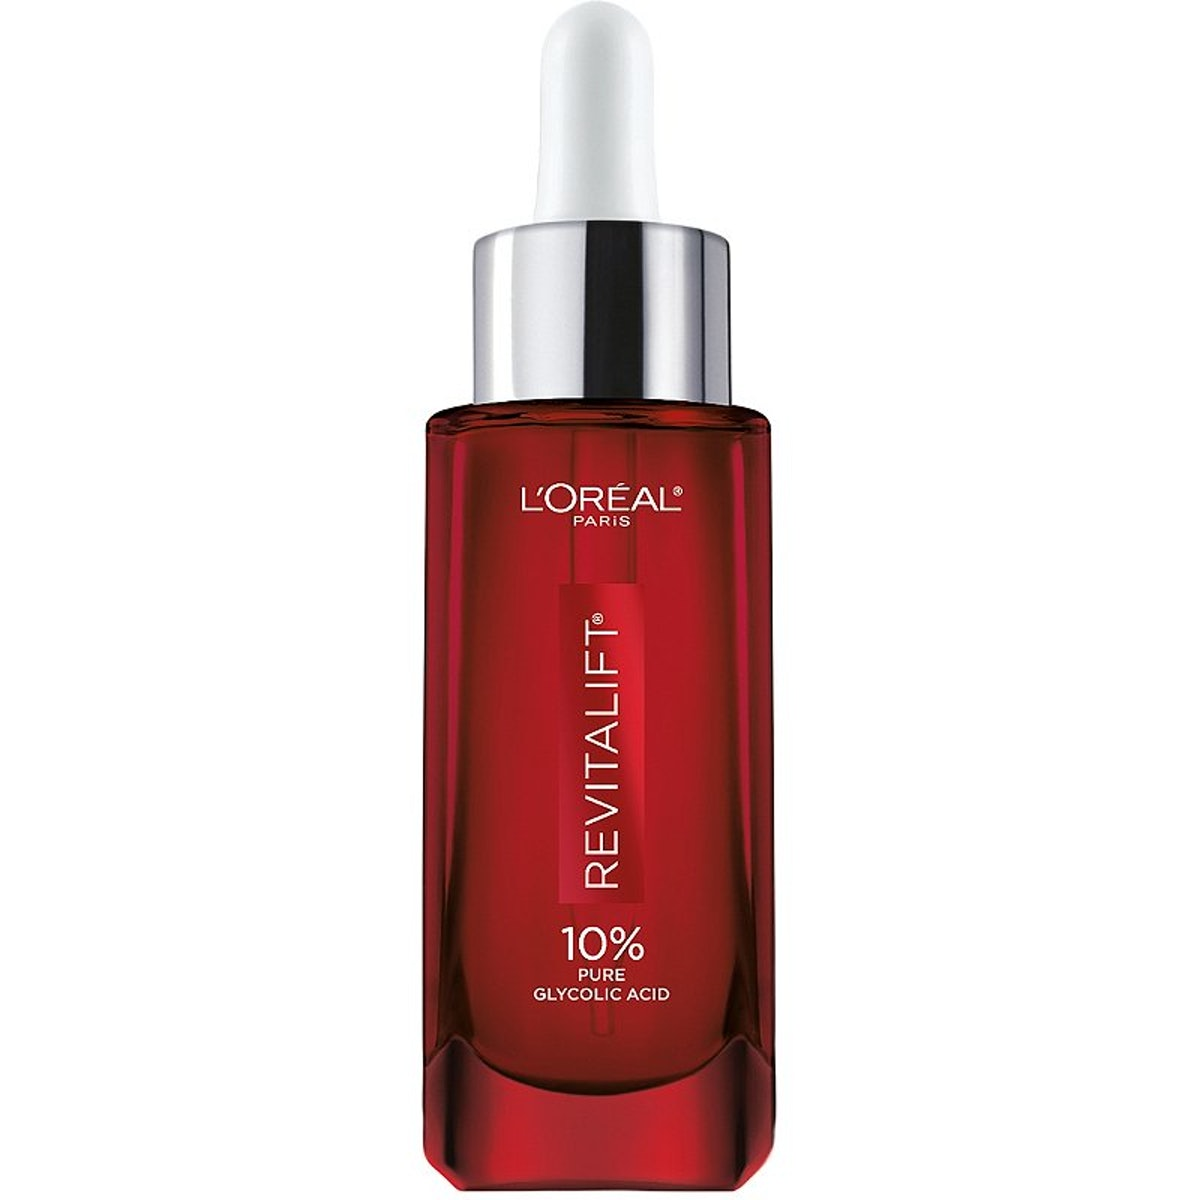 Revitalift Derm Intensives 10% Pure Glycolic Acid Serum